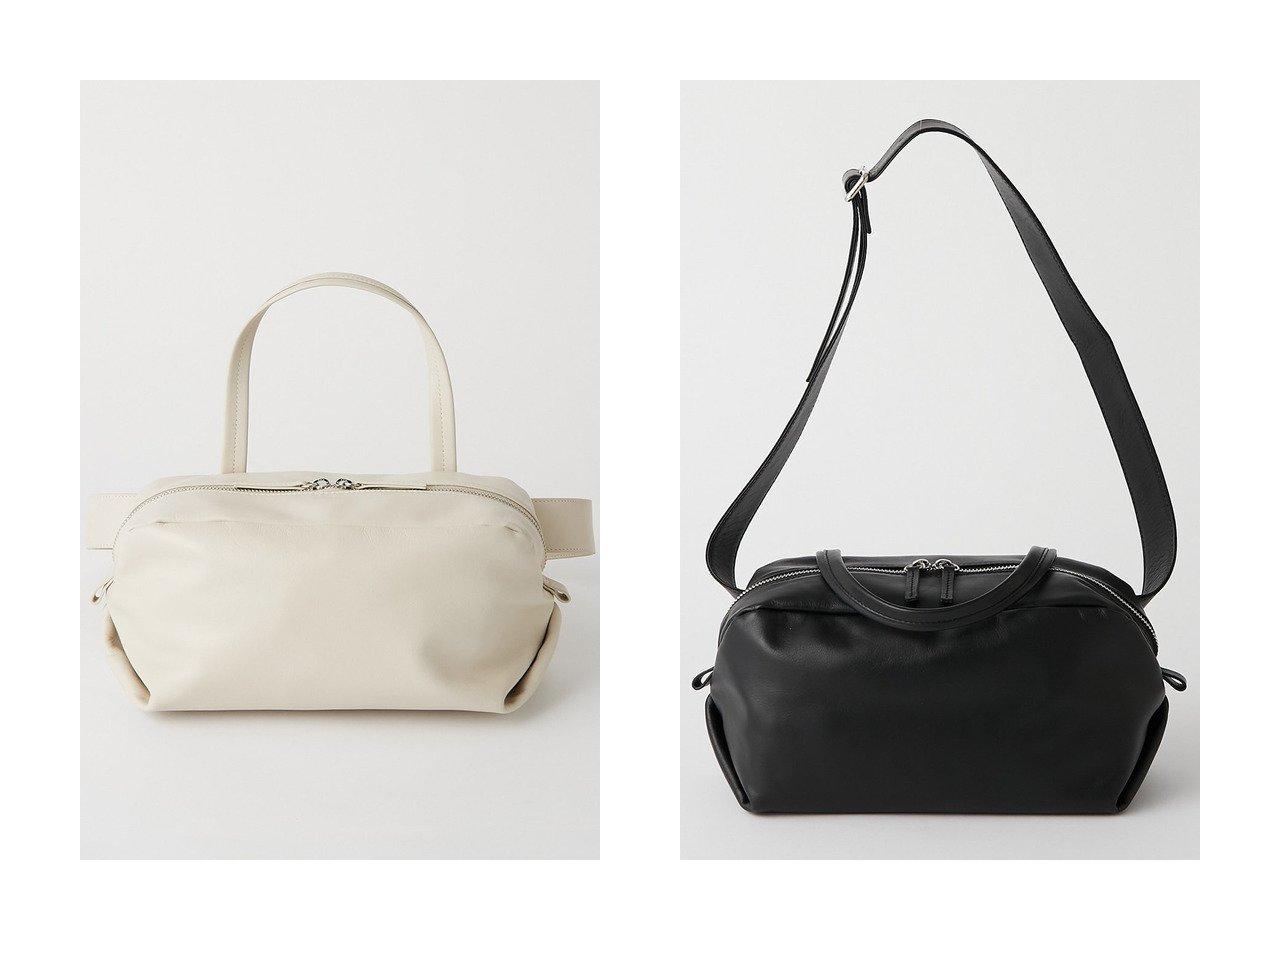 【GALLARDAGALANTE/ガリャルダガランテ】のレザーワンハンドルバッグ バッグ・鞄のおすすめ!人気、トレンド・レディースファッションの通販 おすすめで人気の流行・トレンド、ファッションの通販商品 メンズファッション・キッズファッション・インテリア・家具・レディースファッション・服の通販 founy(ファニー) https://founy.com/ ファッション Fashion レディースファッション WOMEN バッグ Bag 2021年 2021 2021 春夏 S/S SS Spring/Summer 2021 S/S 春夏 SS Spring/Summer ハンドバッグ 春 Spring |ID:crp329100000024764